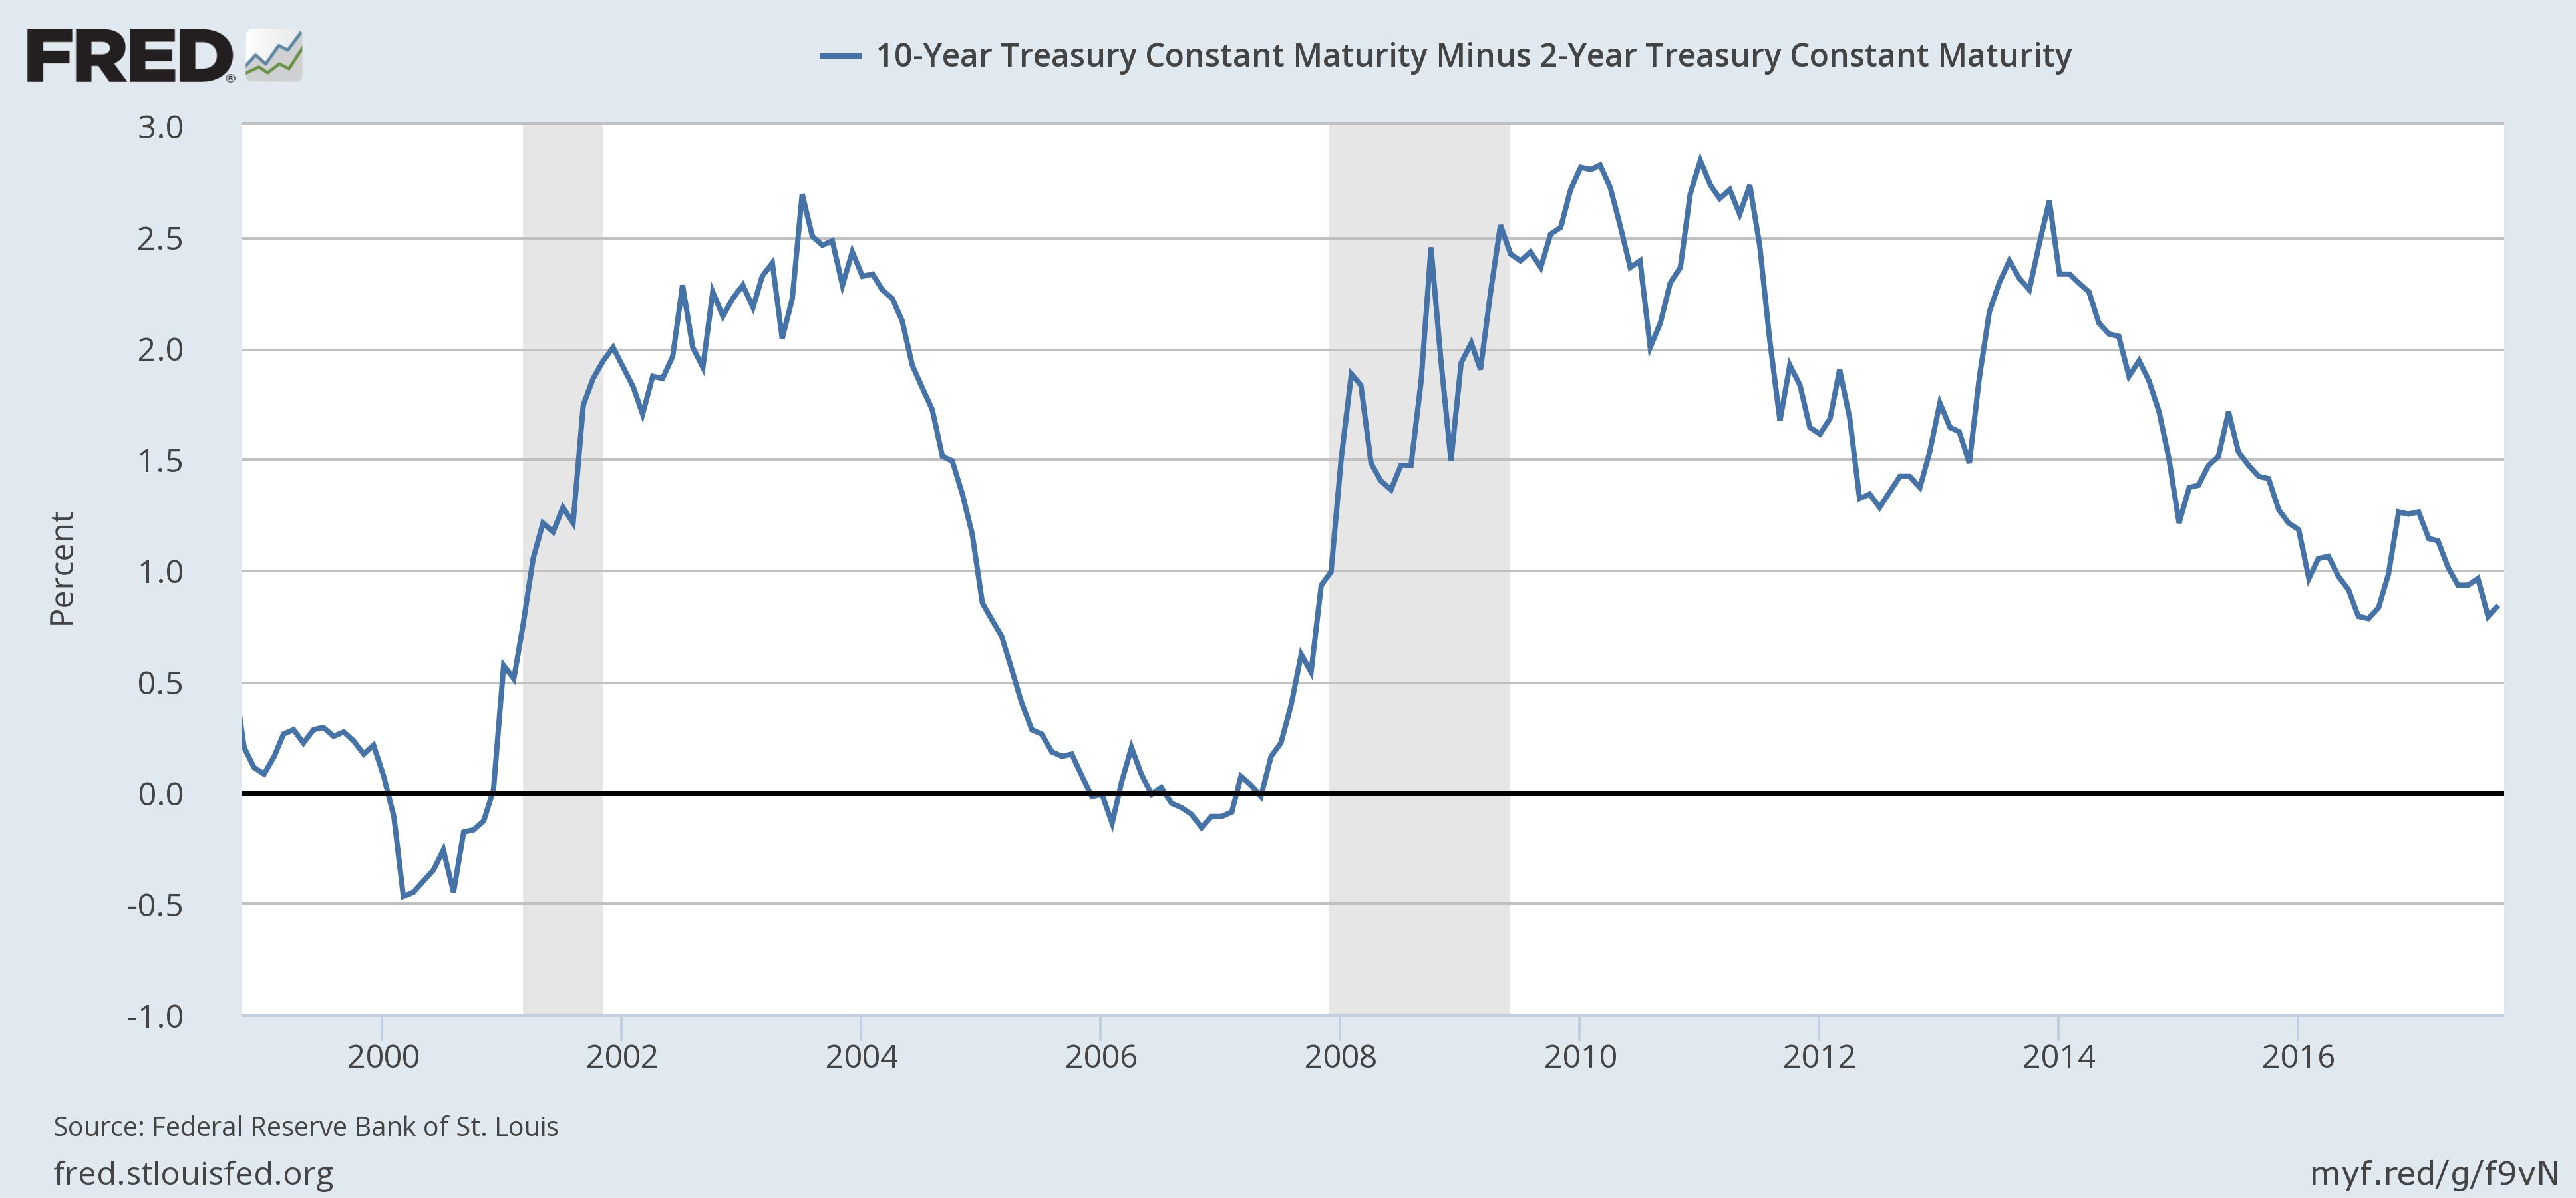 US 10 Year Treasury Constant Maturity, 2000 - 2017